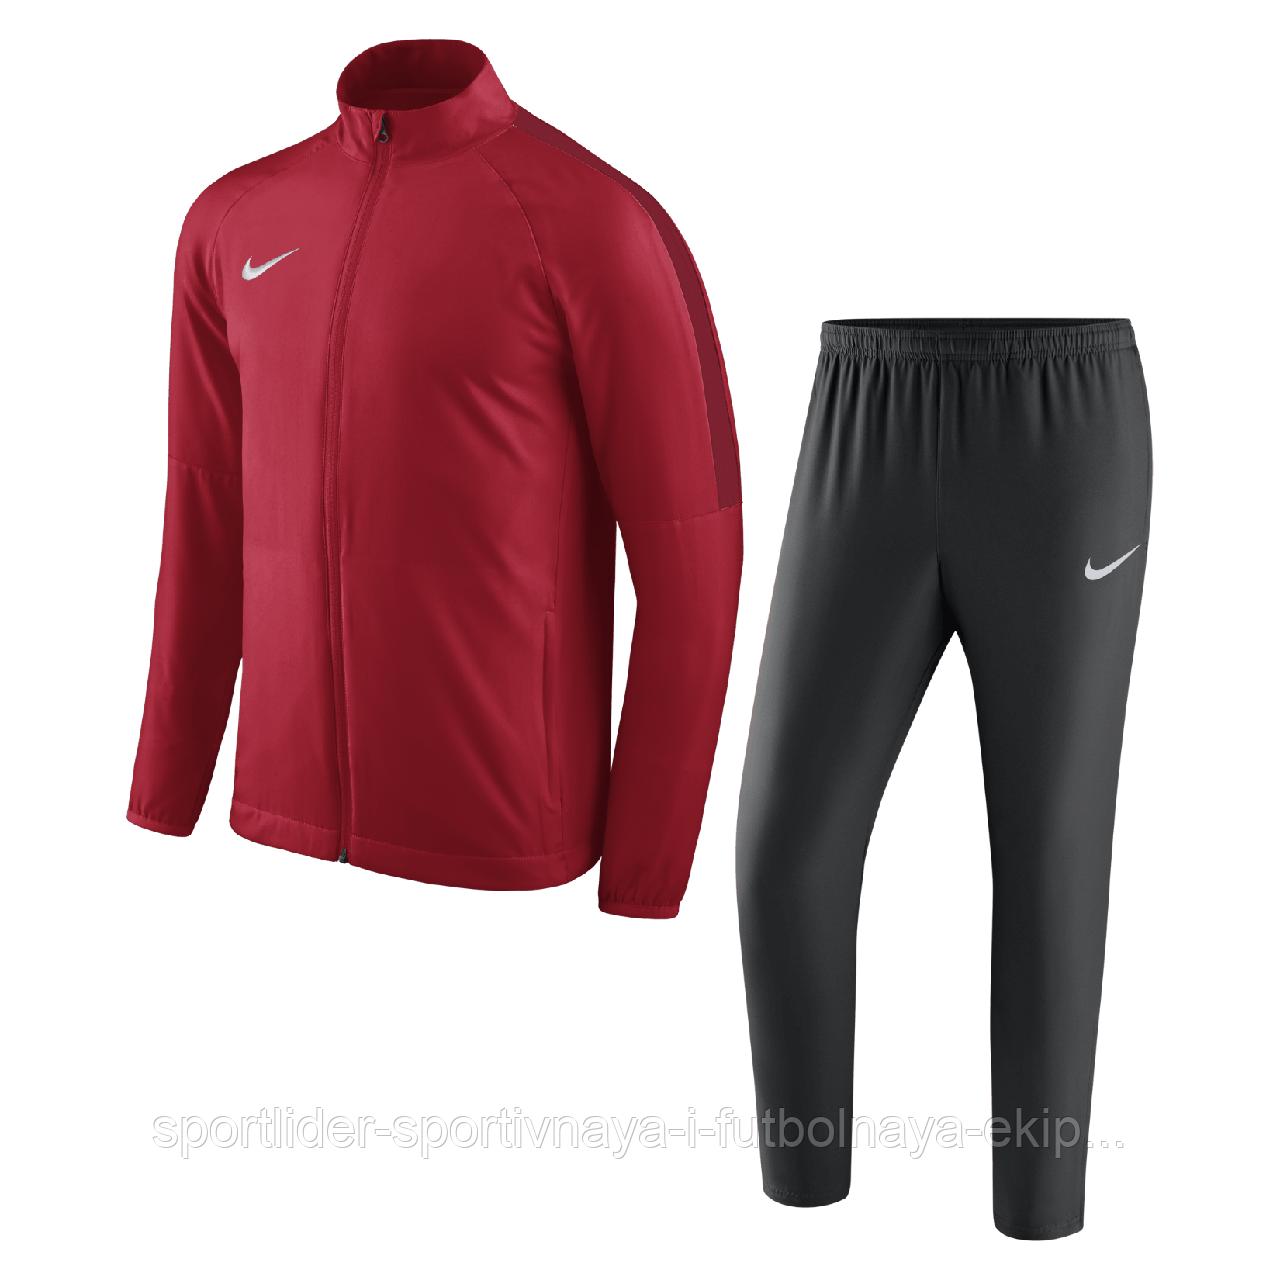 e749749a Спортивный костюм Nike Academy 18 Woven Track Suit 893709-657 ...